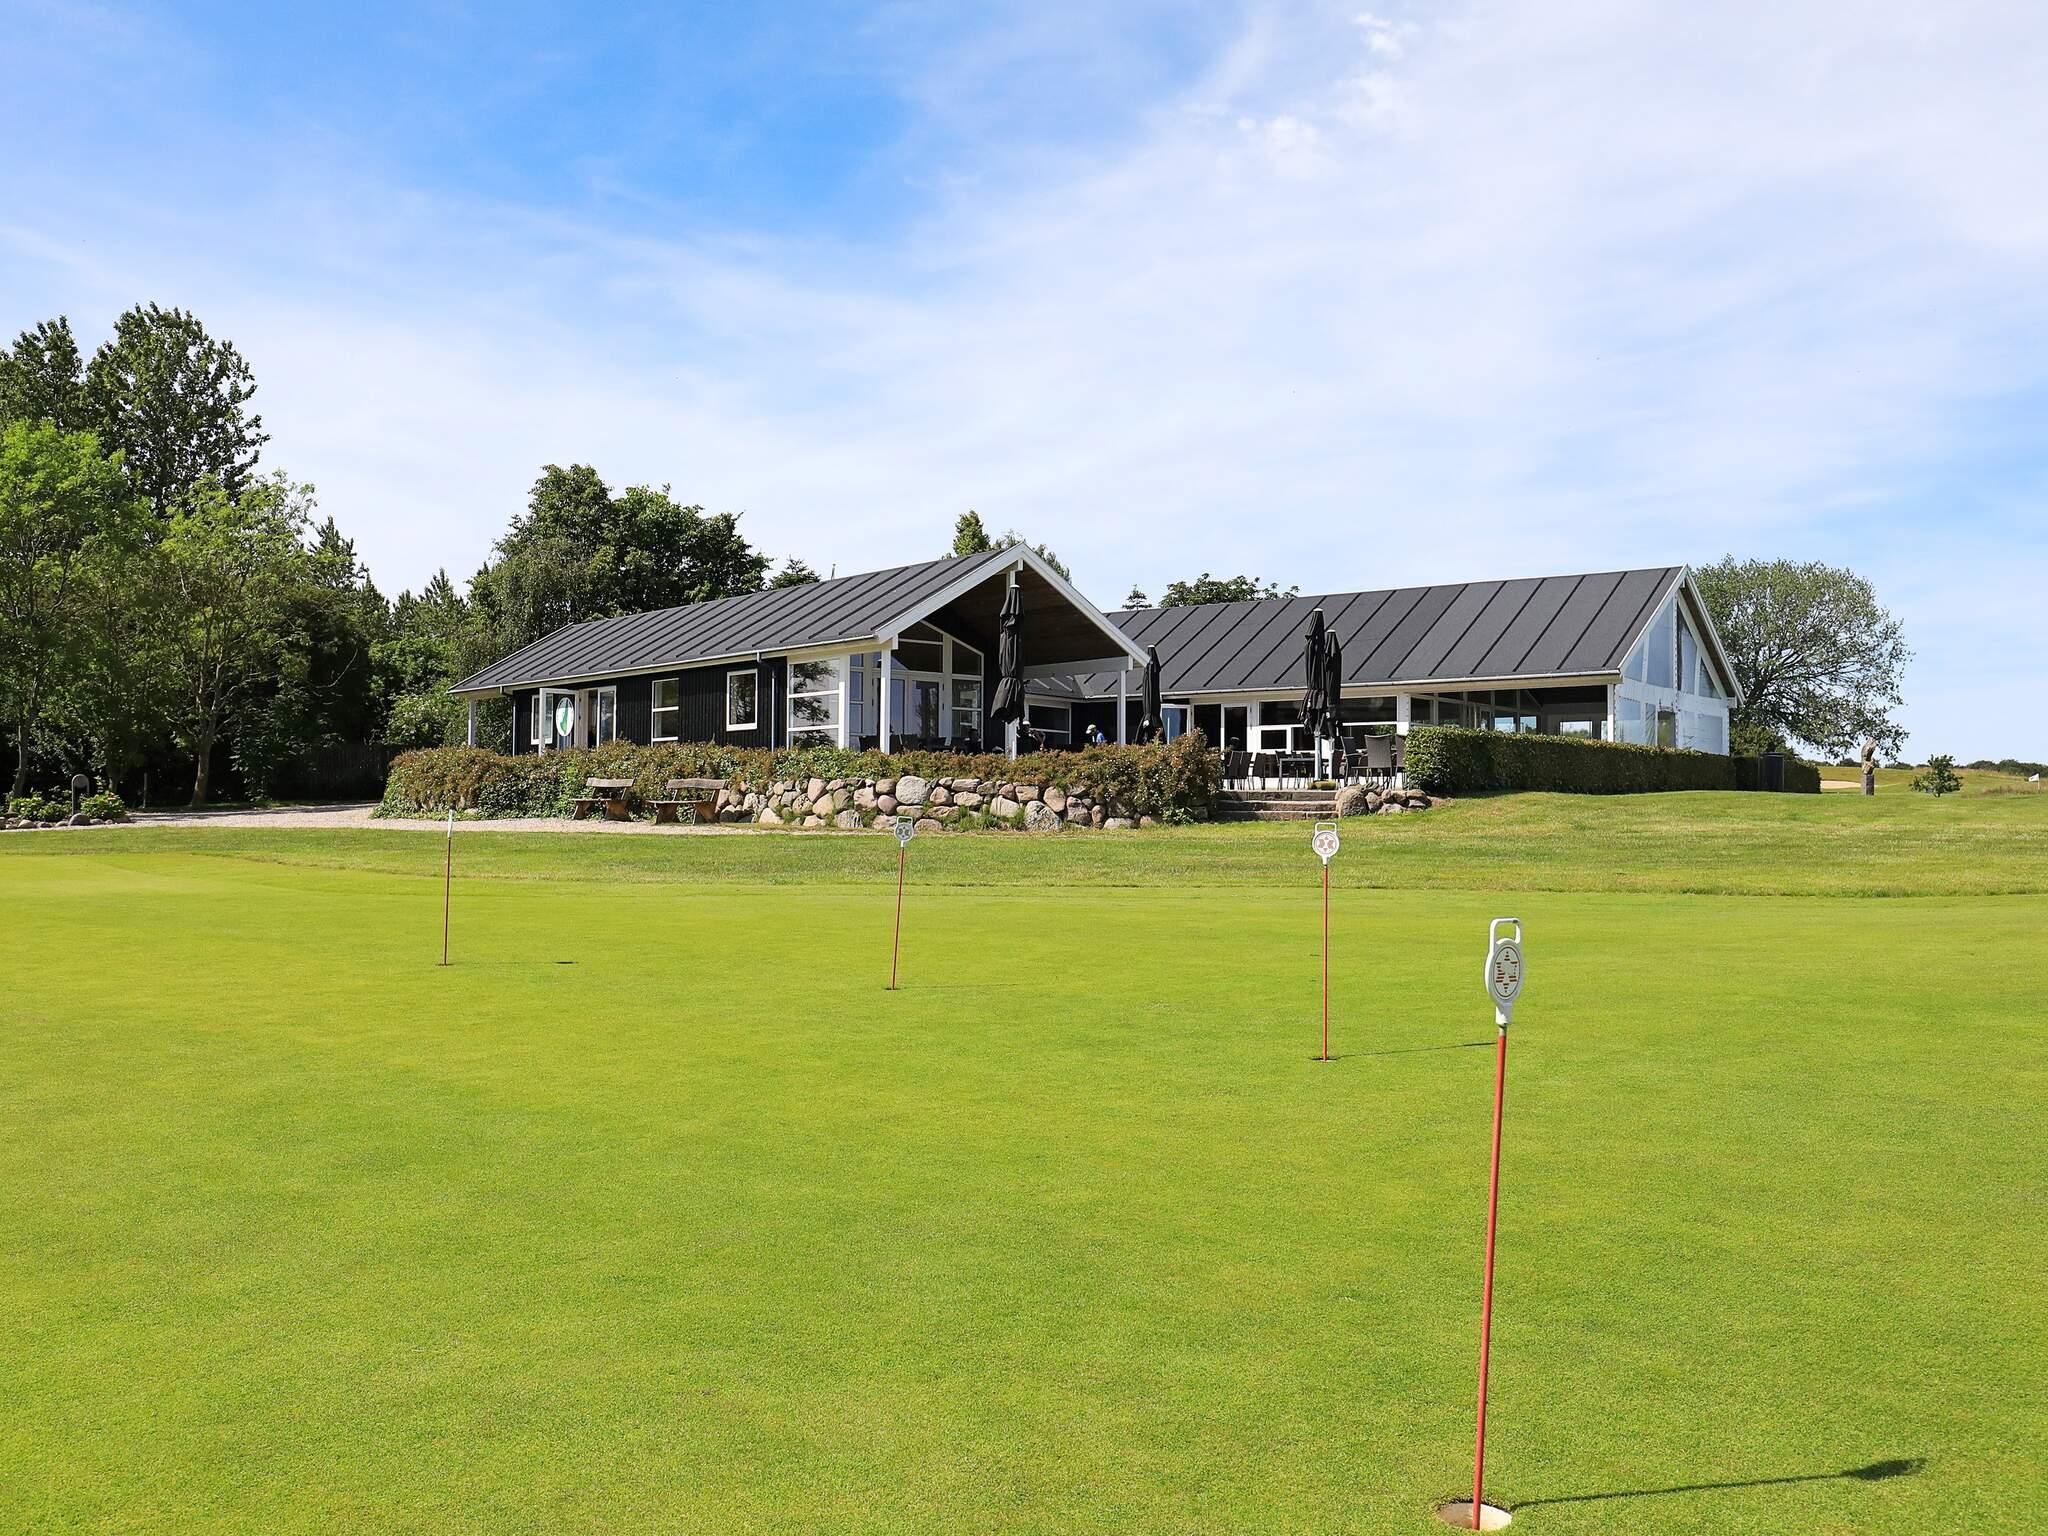 Ferienhaus Bukkemose (2354672), Humble, , Langeland, Dänemark, Bild 20